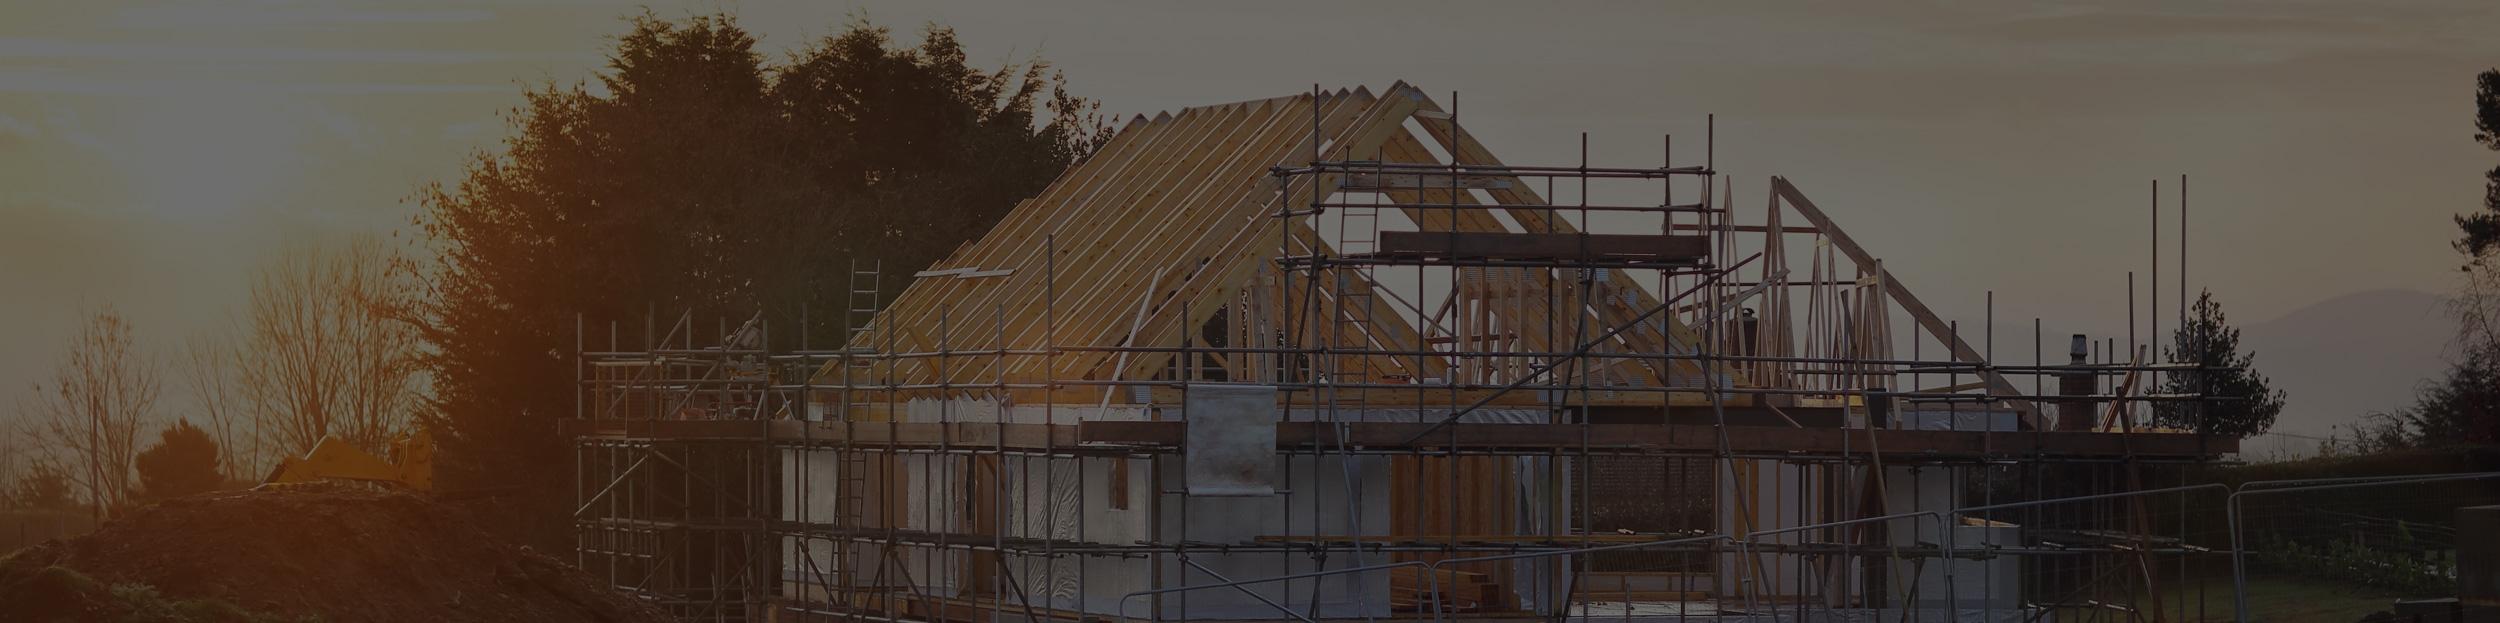 Building Nidderdale (@buildingnidderdale) Cover Image